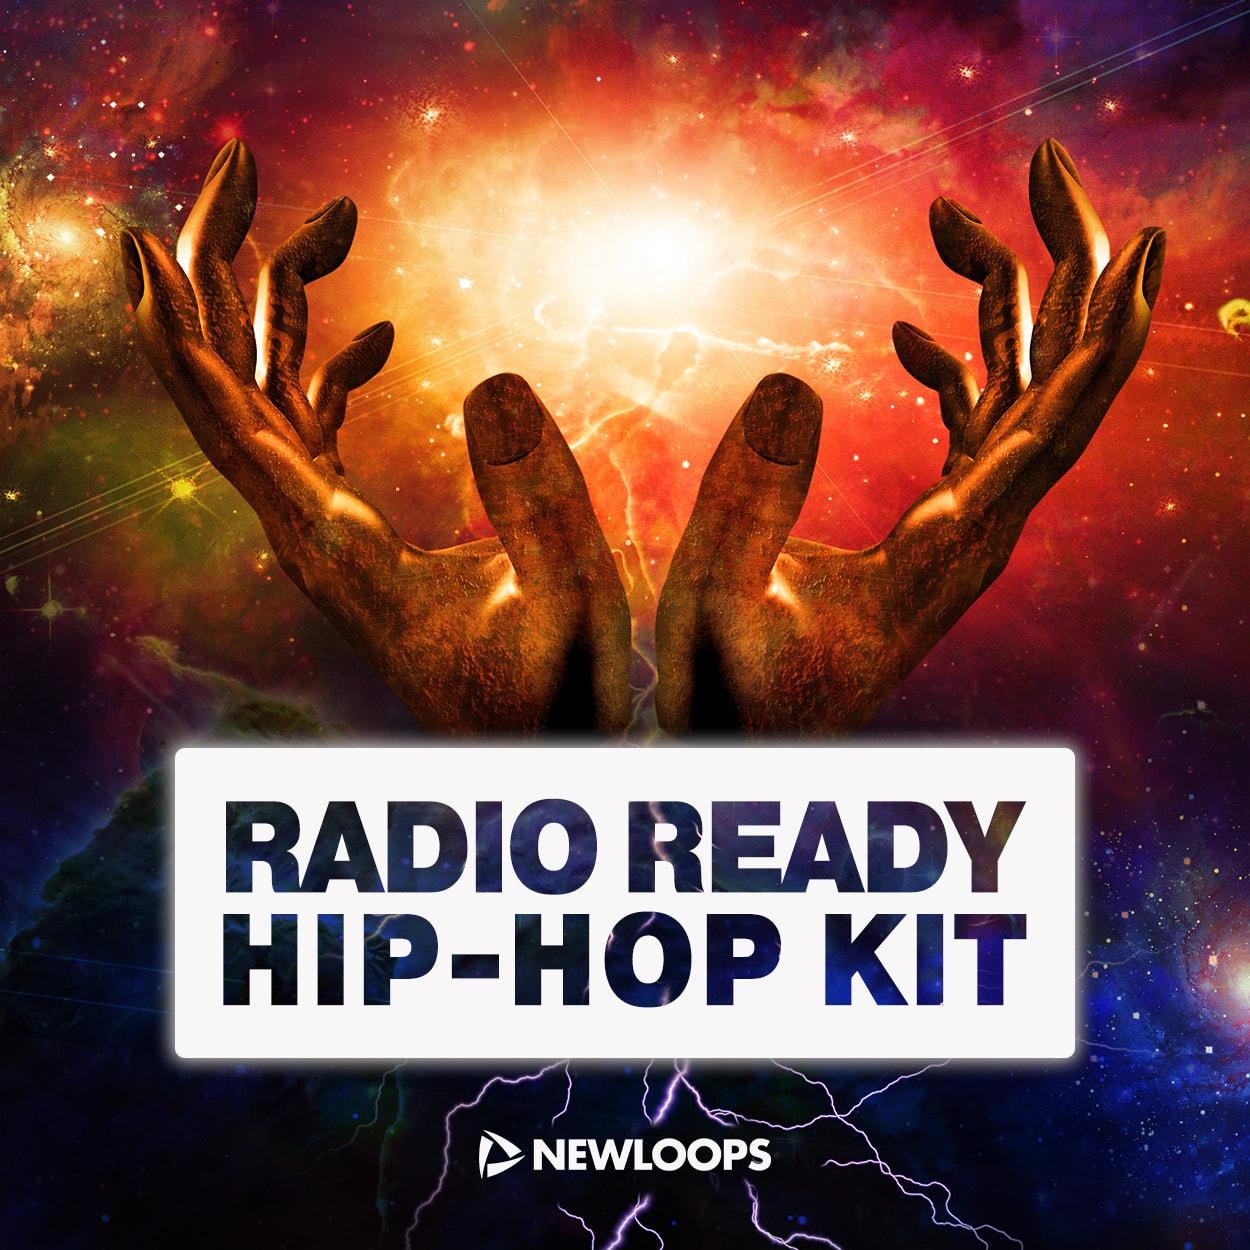 New loops Radio Ready